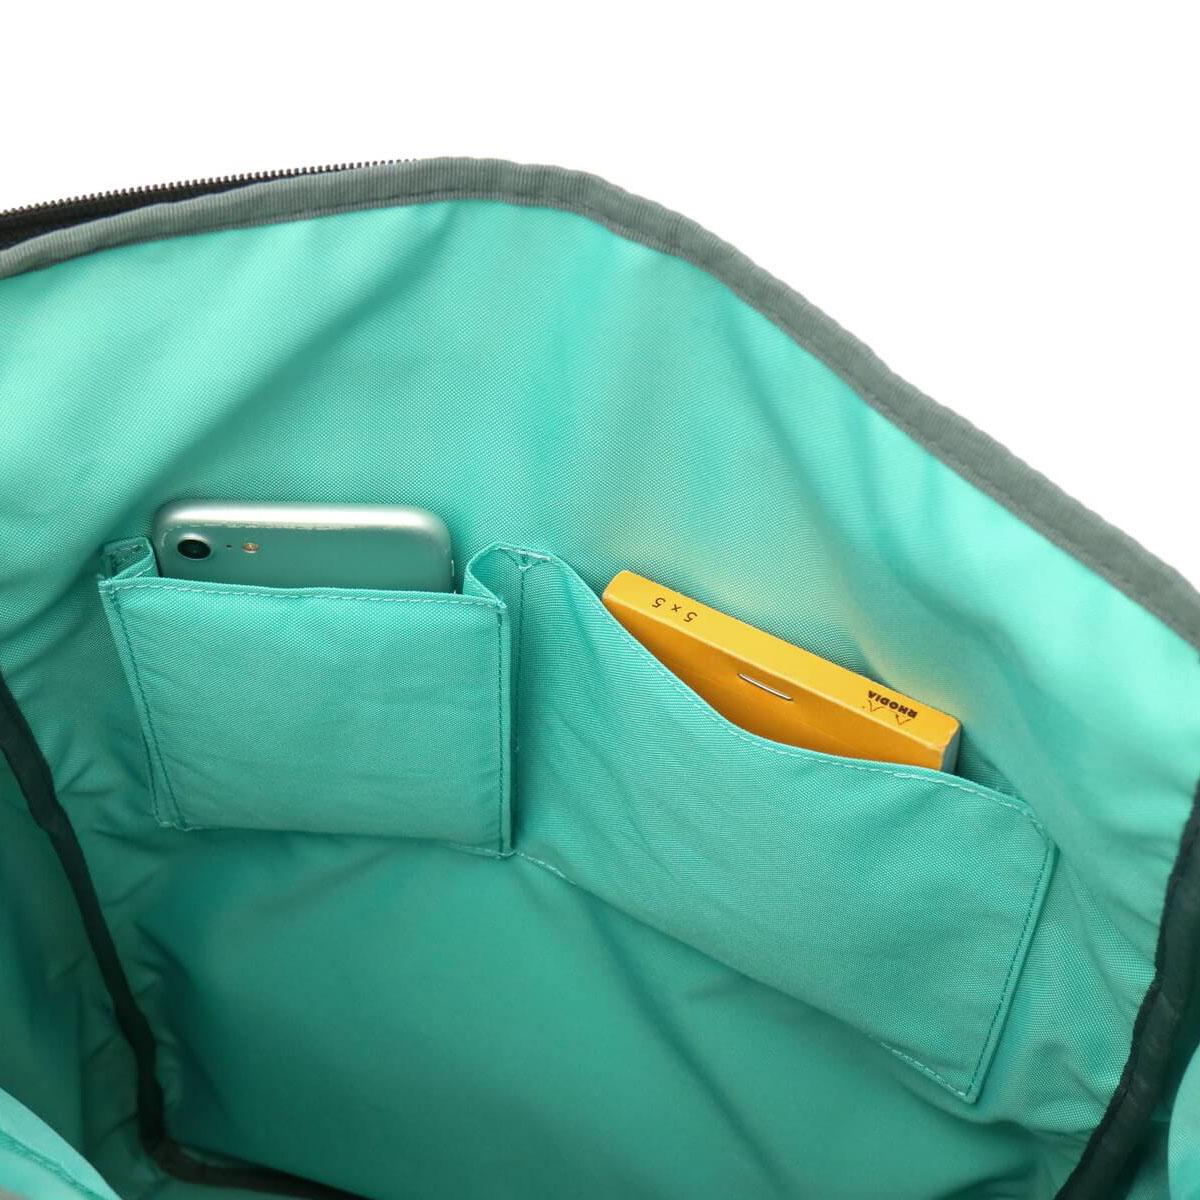 Bianchi square box backpack pack A3 20L PC storage DIBASE men's ladies  NBTC-60 NBTC-60B